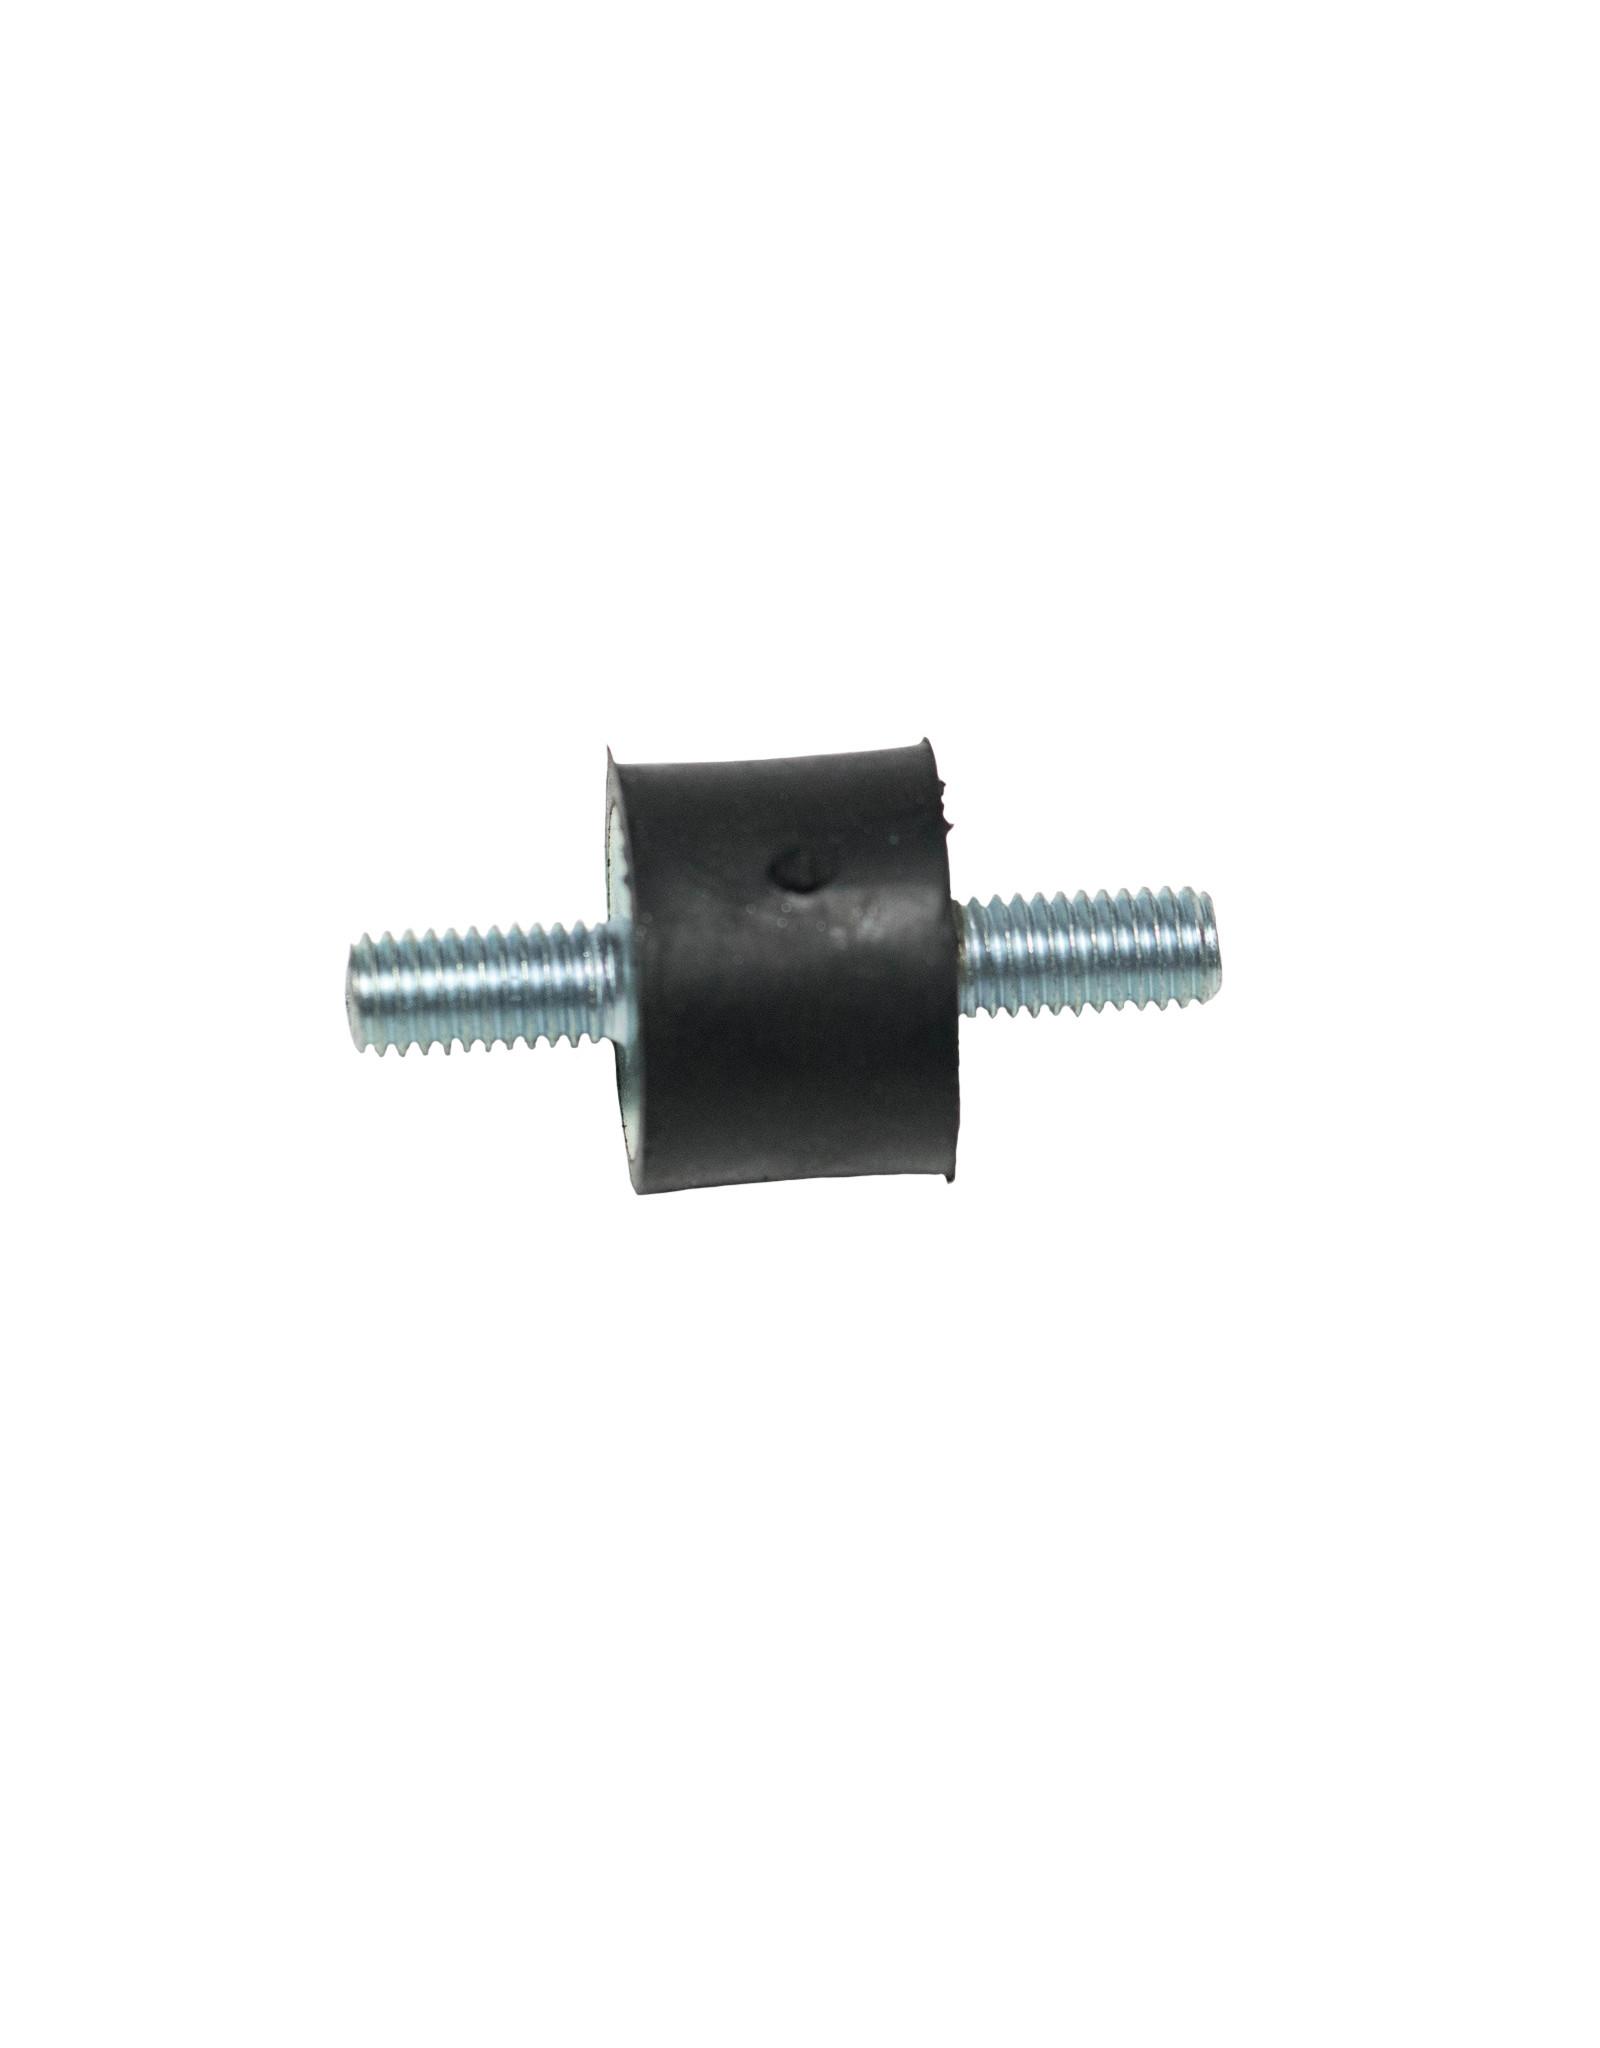 Aprilia Silent Block ( To Fit V990 RSV/Tuono) AP8144061